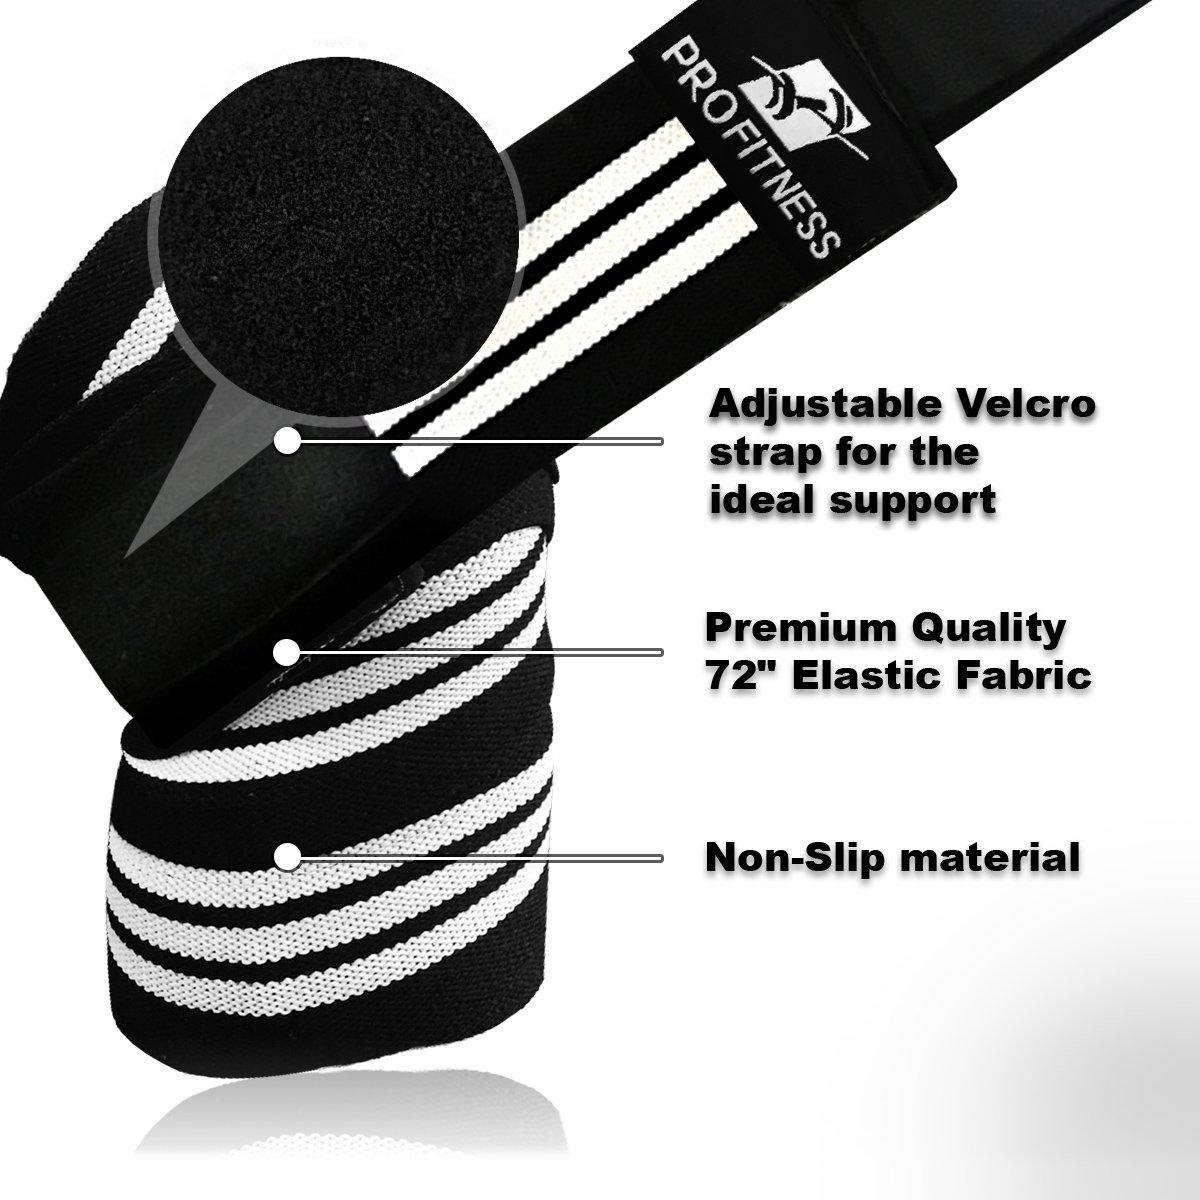 ProFitness Weightlifting Knee Wraps Pair Image 3